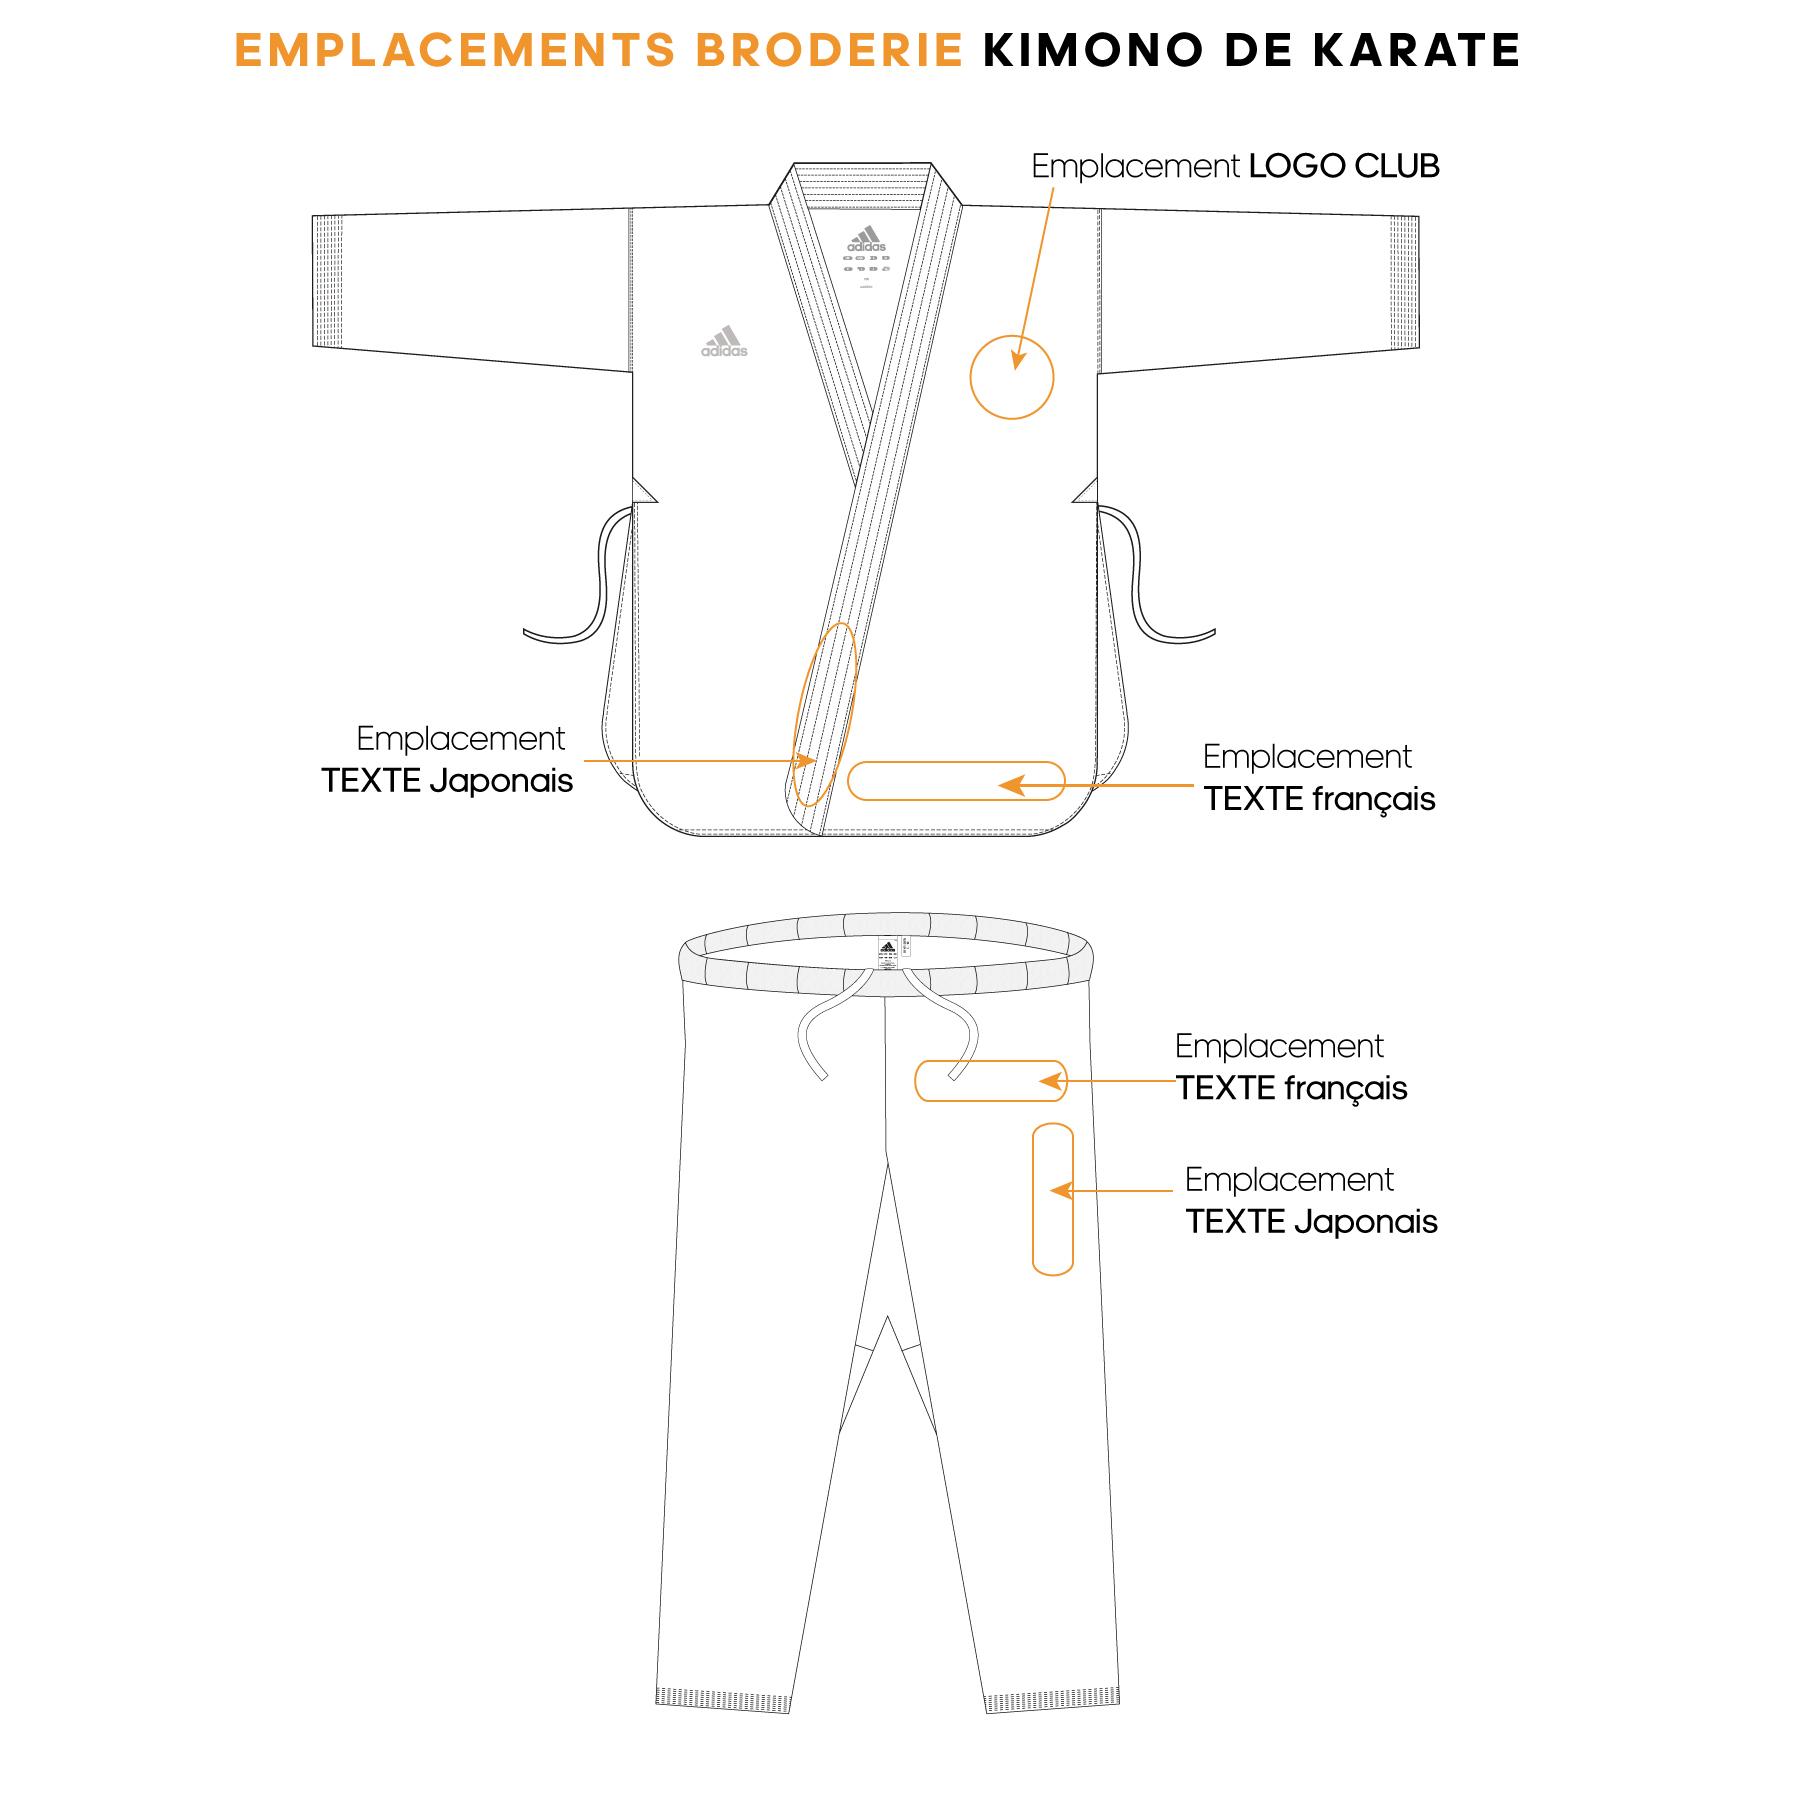 broderie kimono de karaté